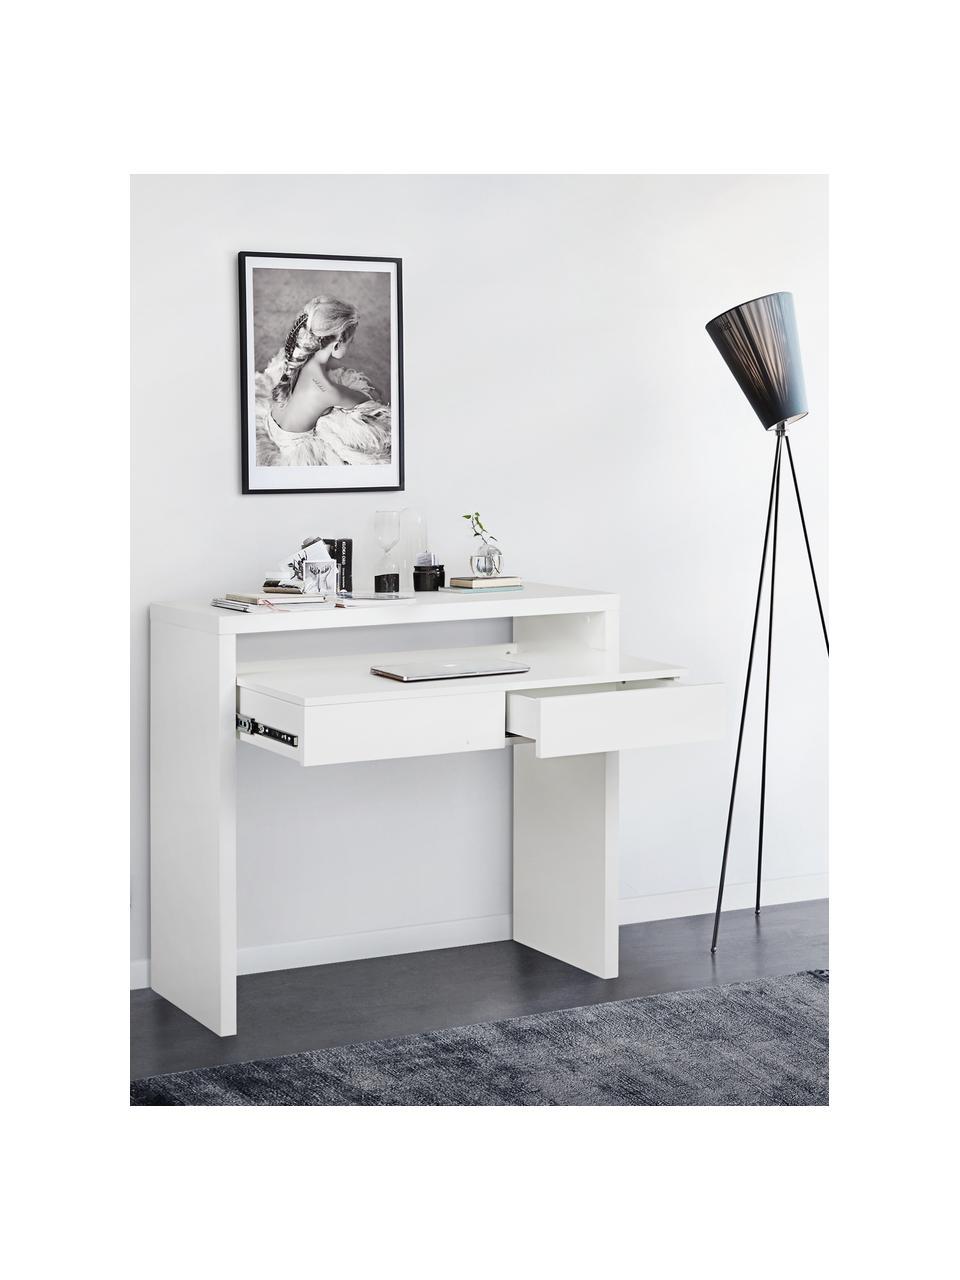 Petit bureau avec plateau extensible Teresa, Blanc